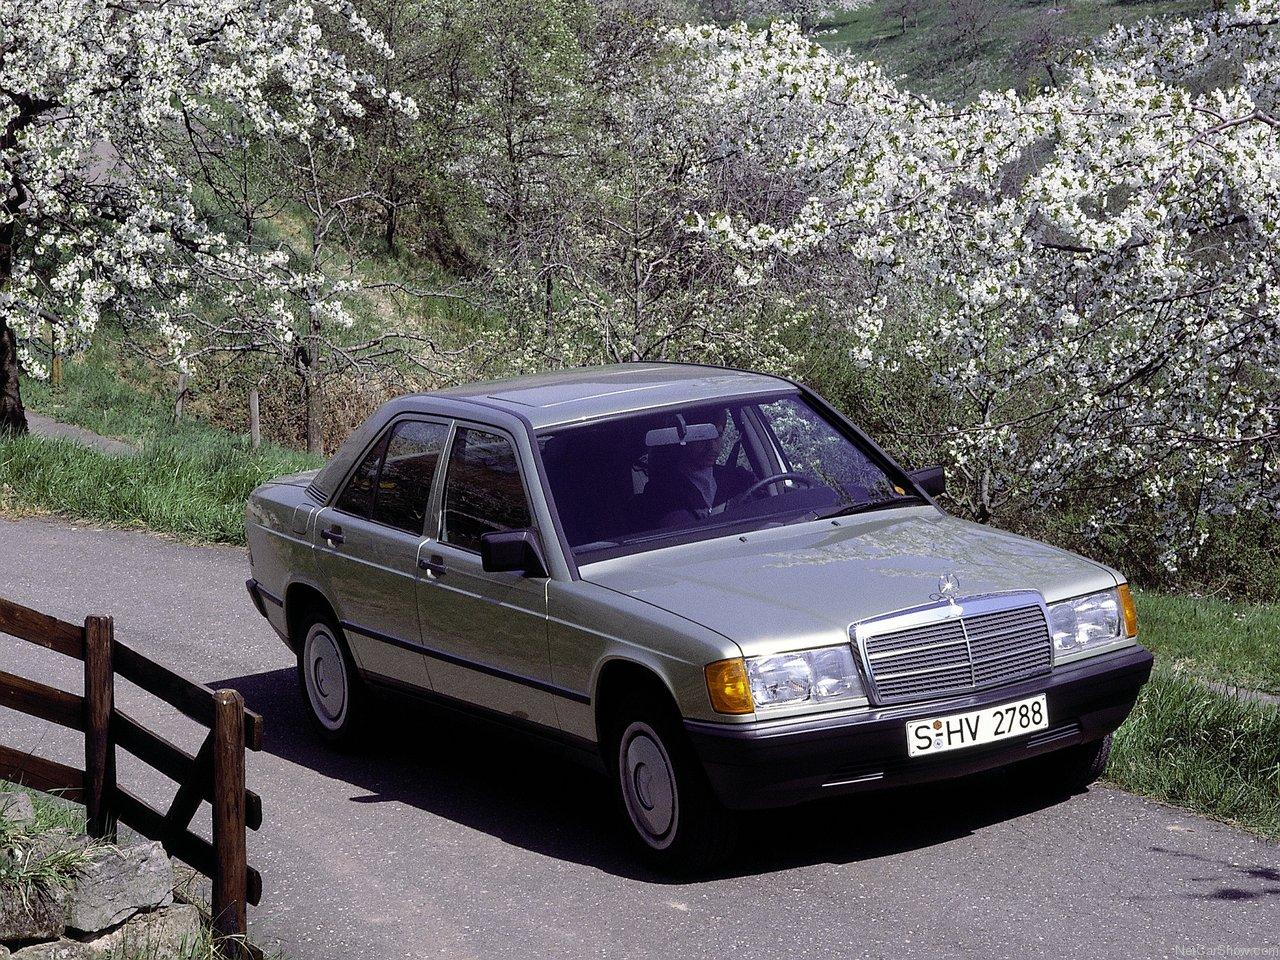 http://4.bp.blogspot.com/-Wly4Q8IoxAw/UUOH7LmDR_I/AAAAAAAAEdQ/zra2S80ovnQ/s1600/Mercedes-Benz-190E_1984_1280x960_wallpaper_0a.jpg